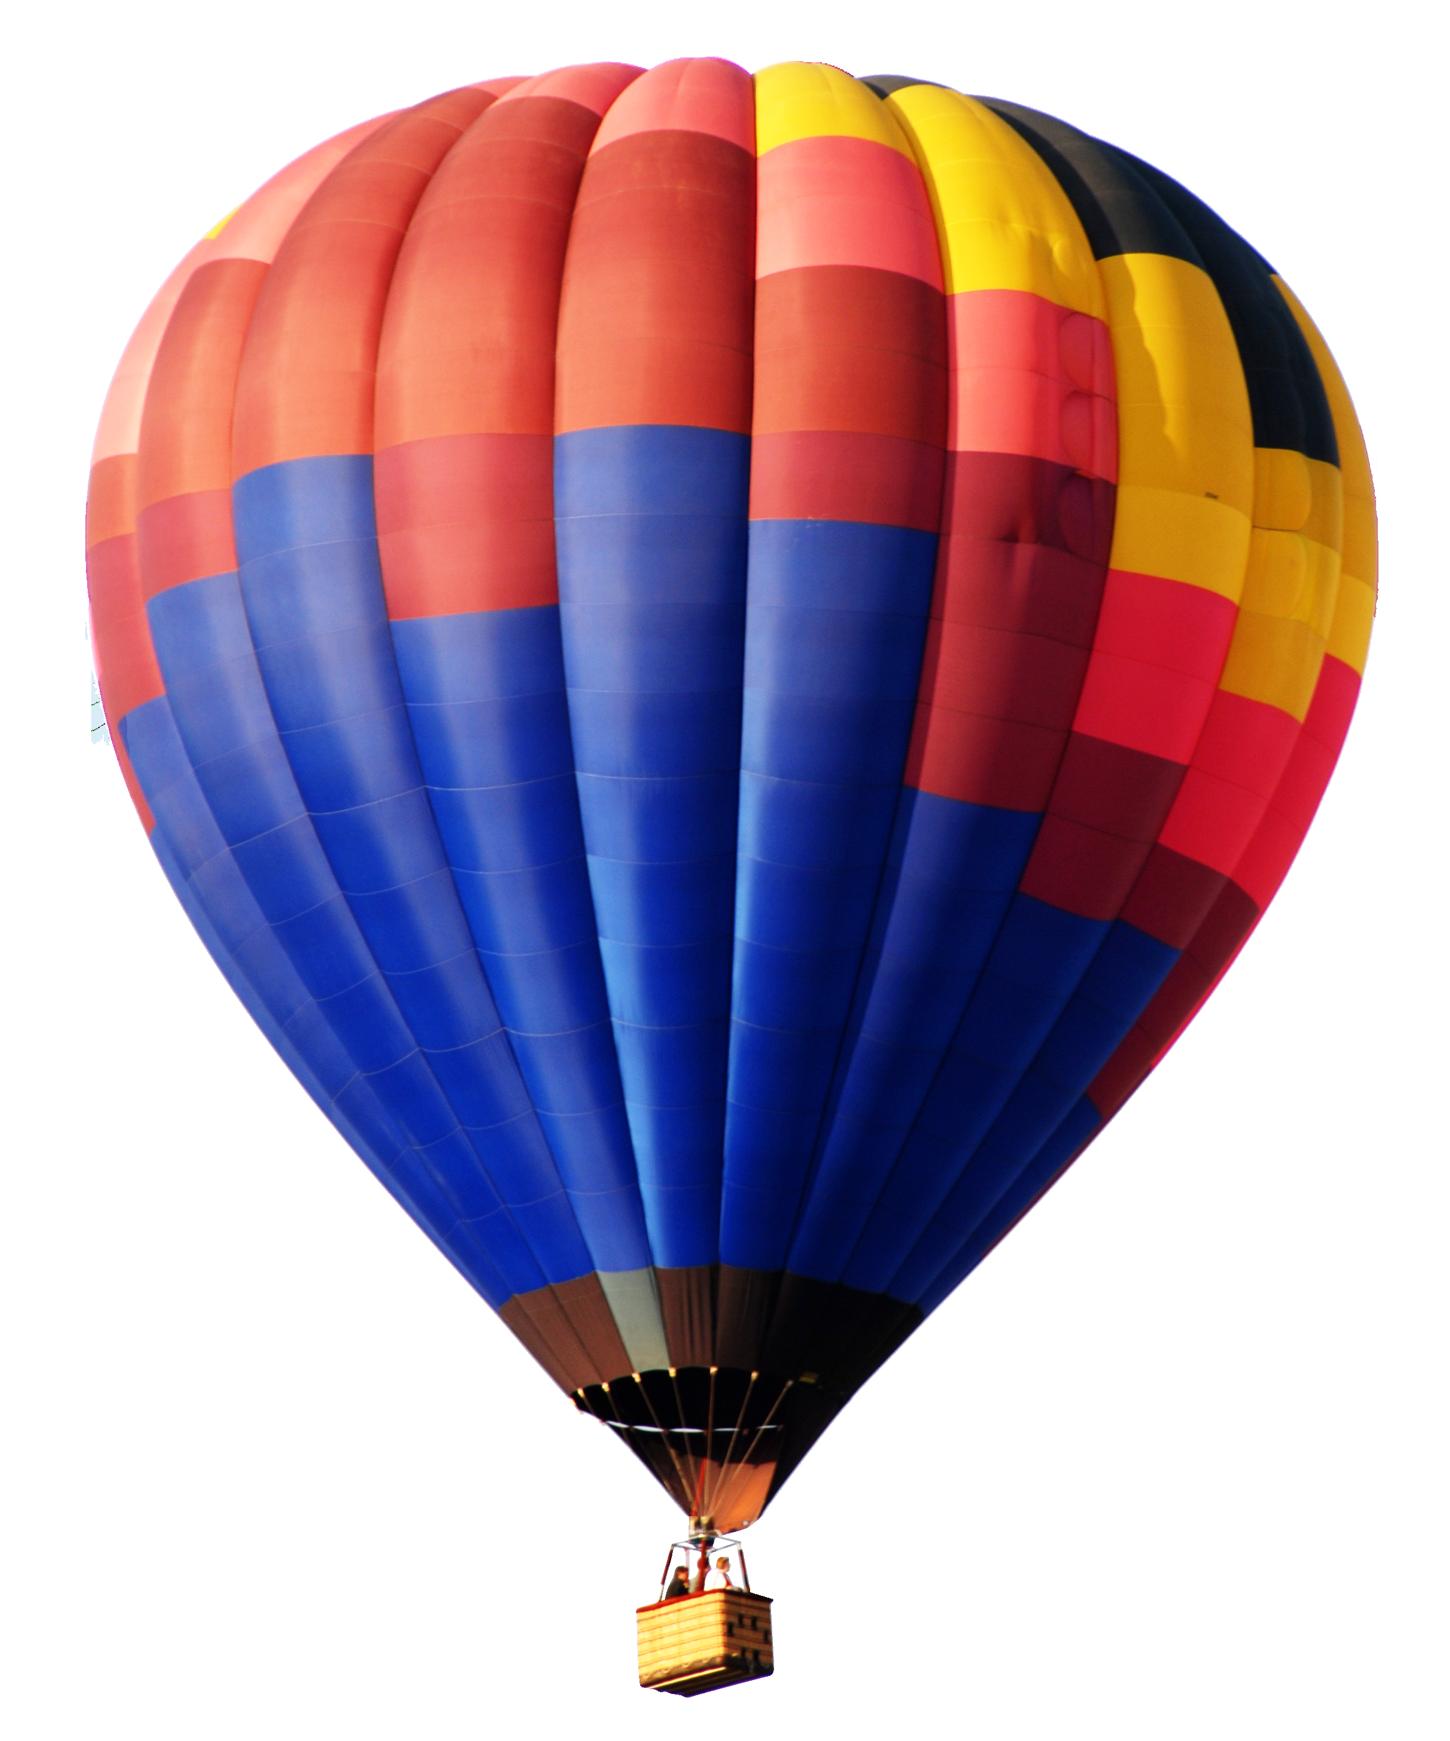 Hot Air Balloon PNG Image Fire balloon, Air balloon, Hot